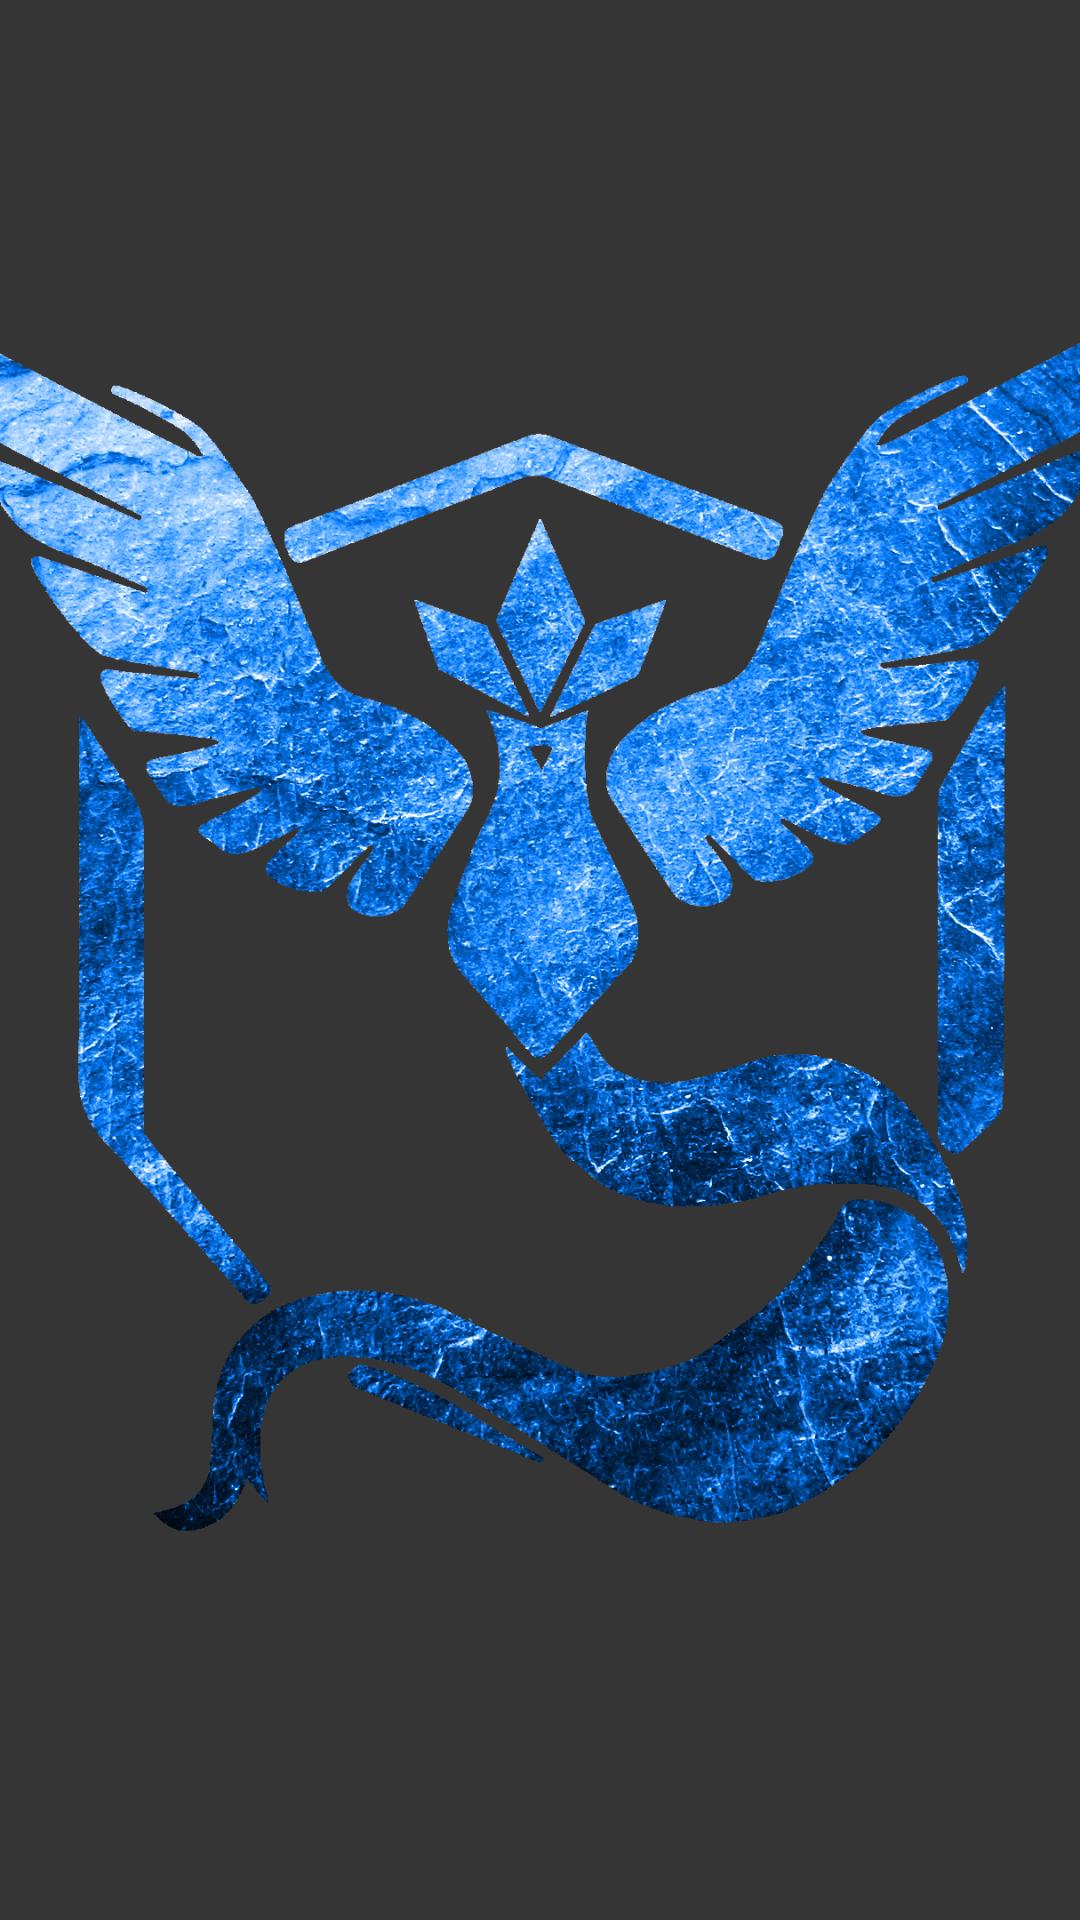 pokemon go team mystic dark blue iphone hd wallpaper piclect